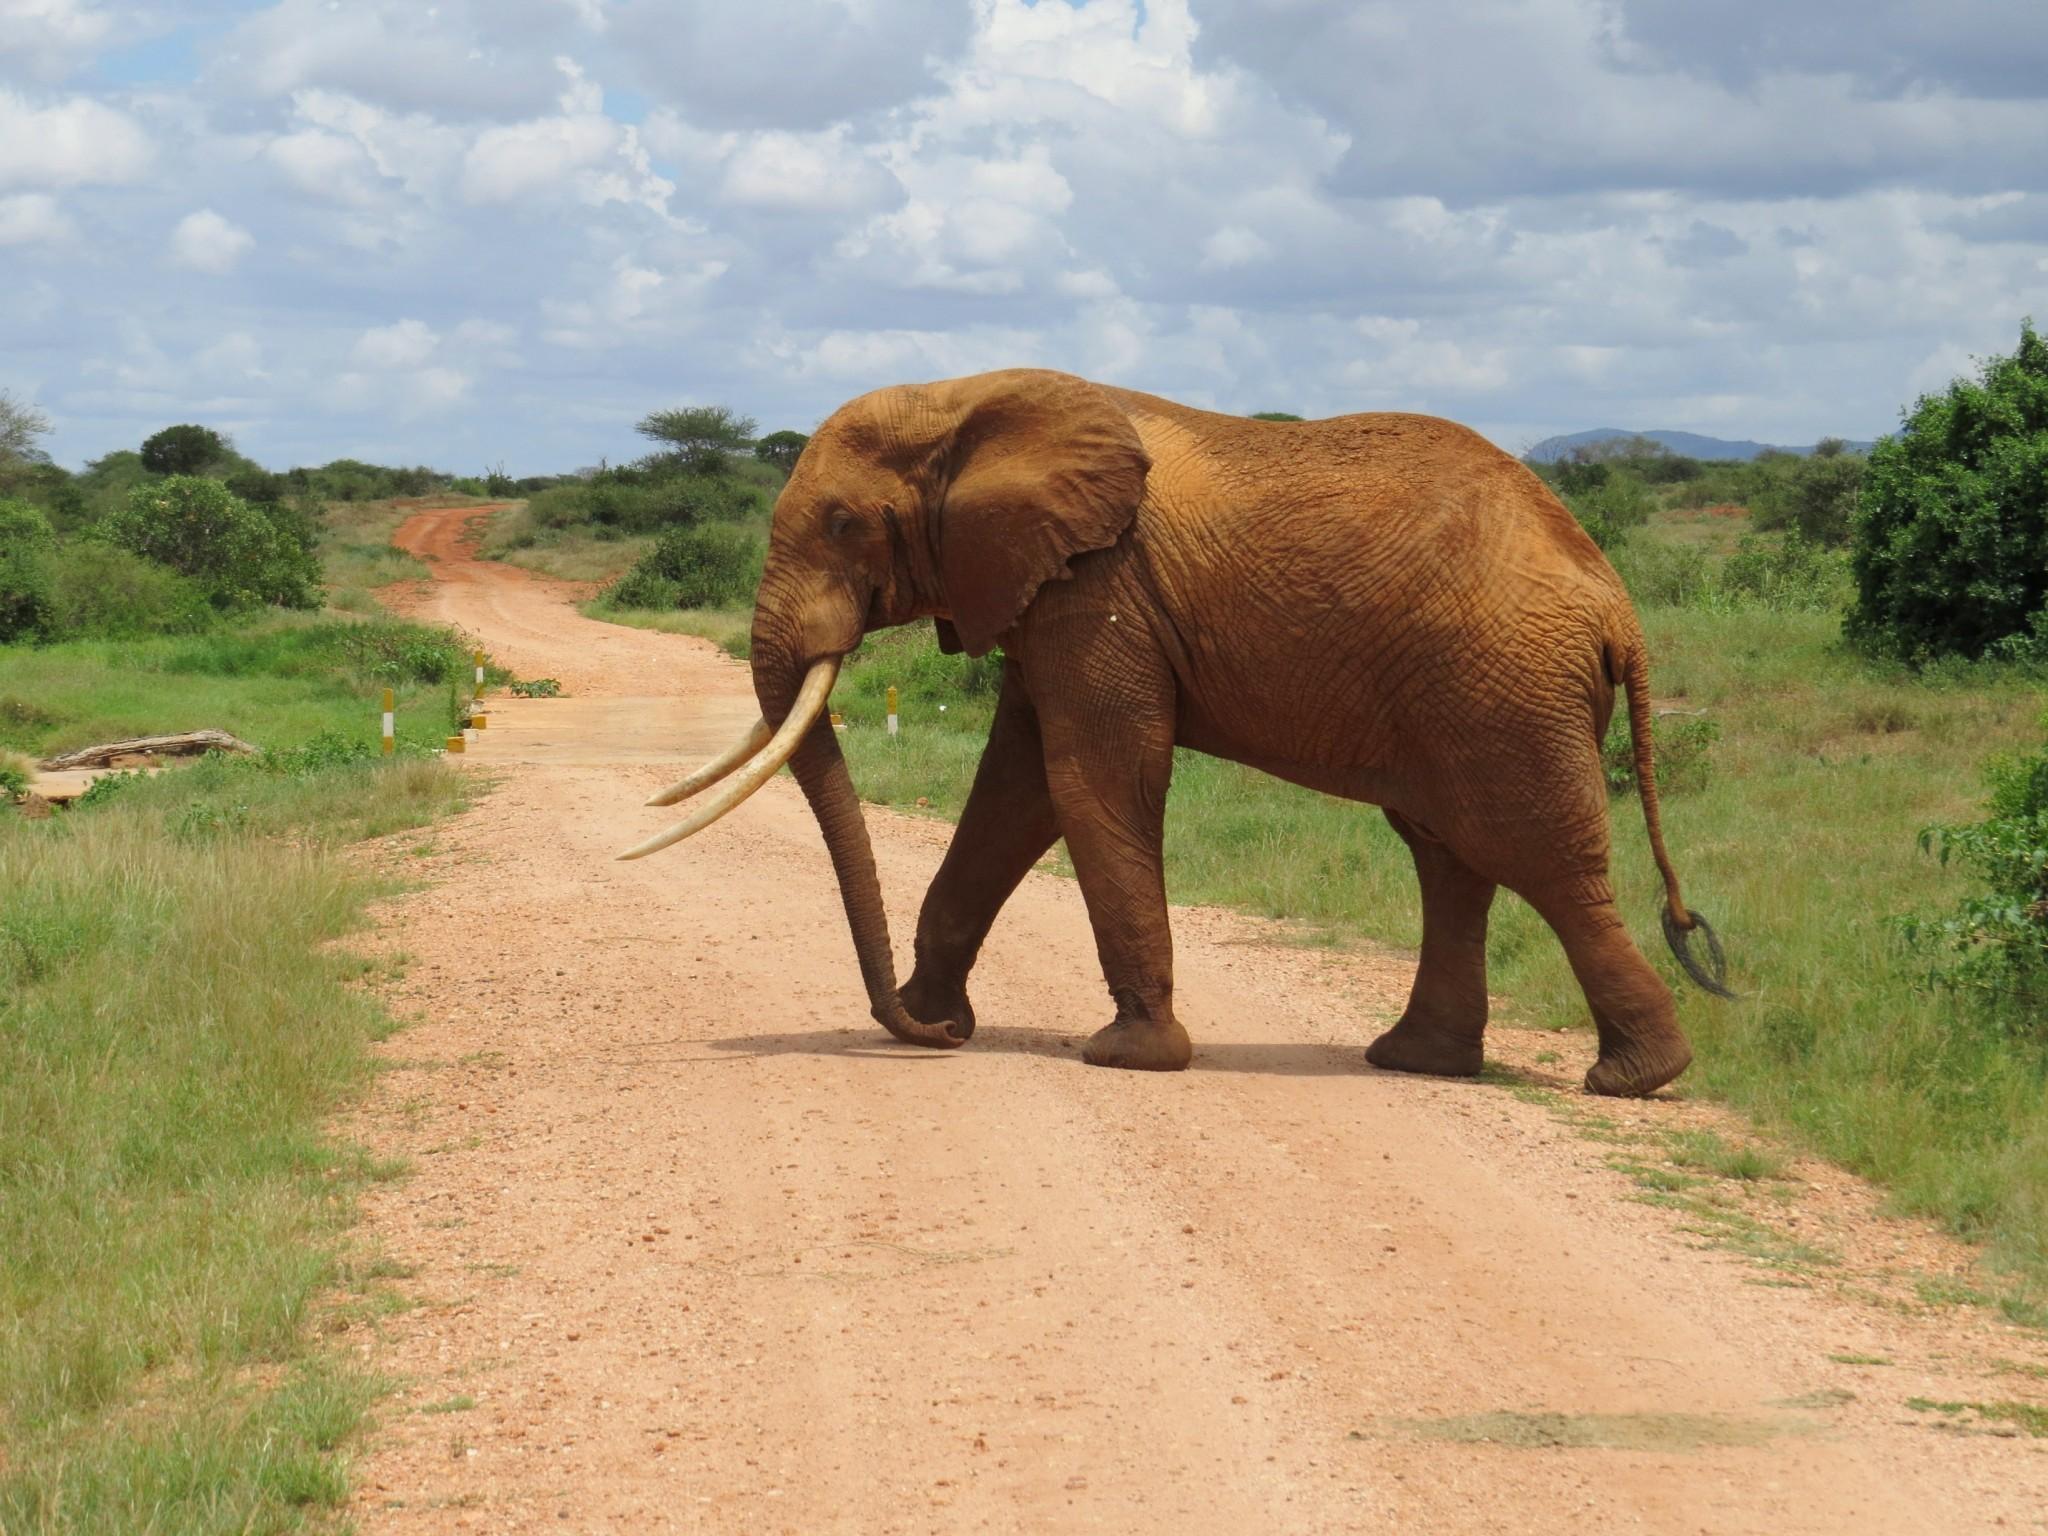 Safari Afrika zum Träumen